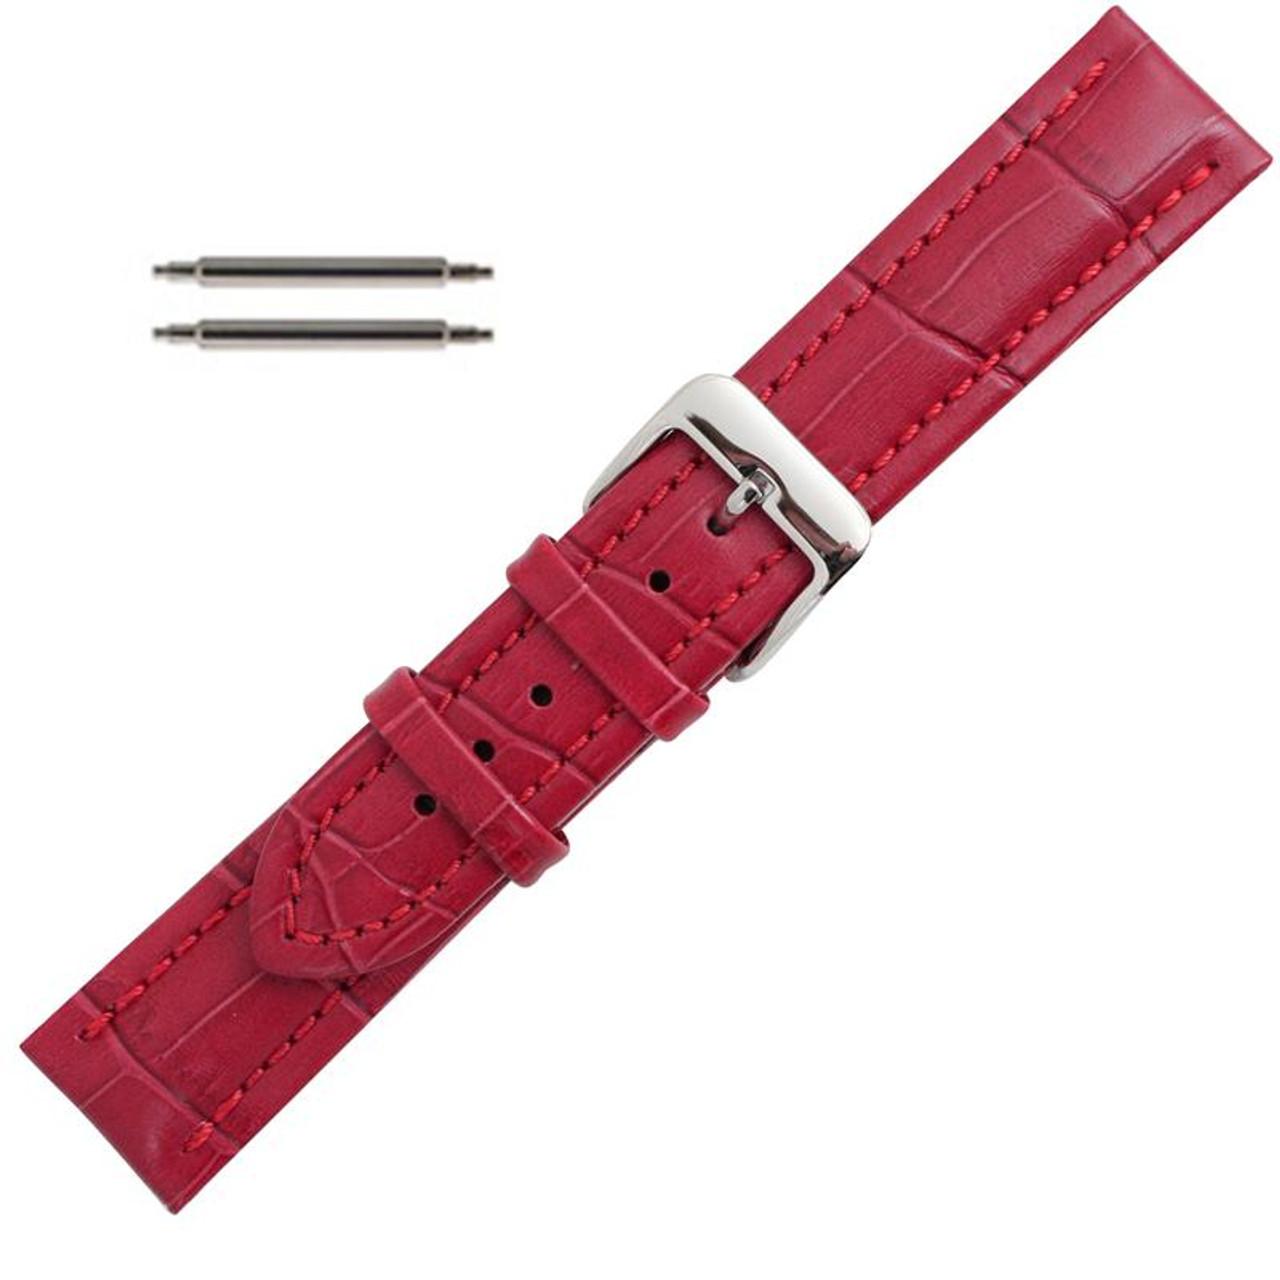 24mm Watch Band Genuine Leather Straps Watch Accessories Watchbands Enhancing Uhrenarmbänder